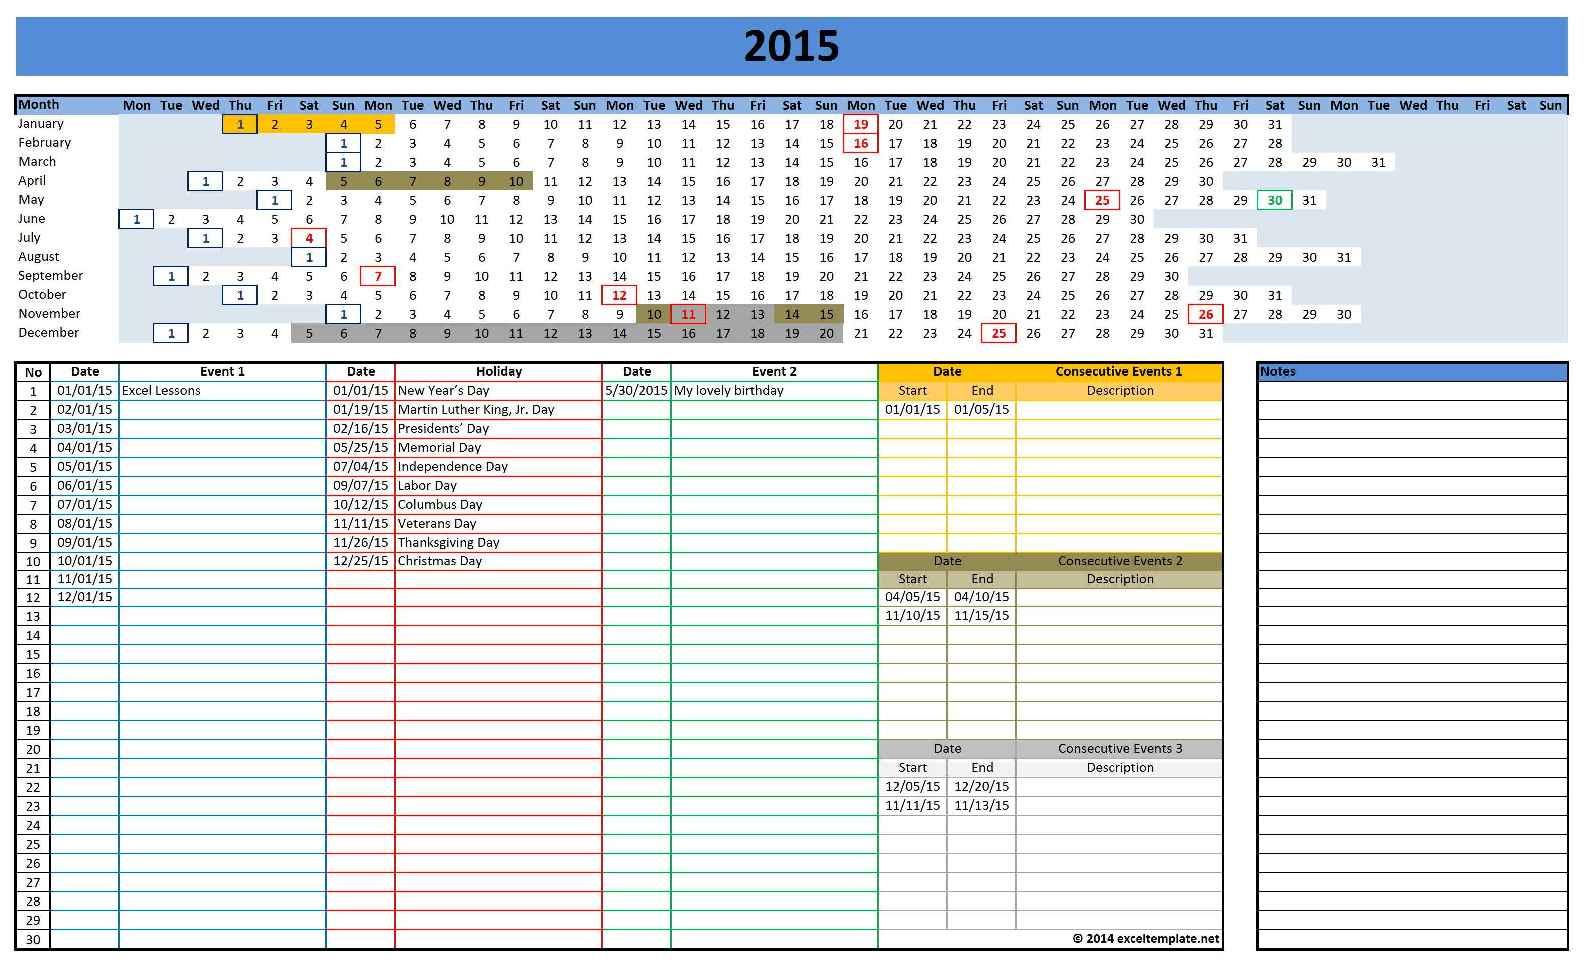 Open Office Spreadsheet Chart Tutorial